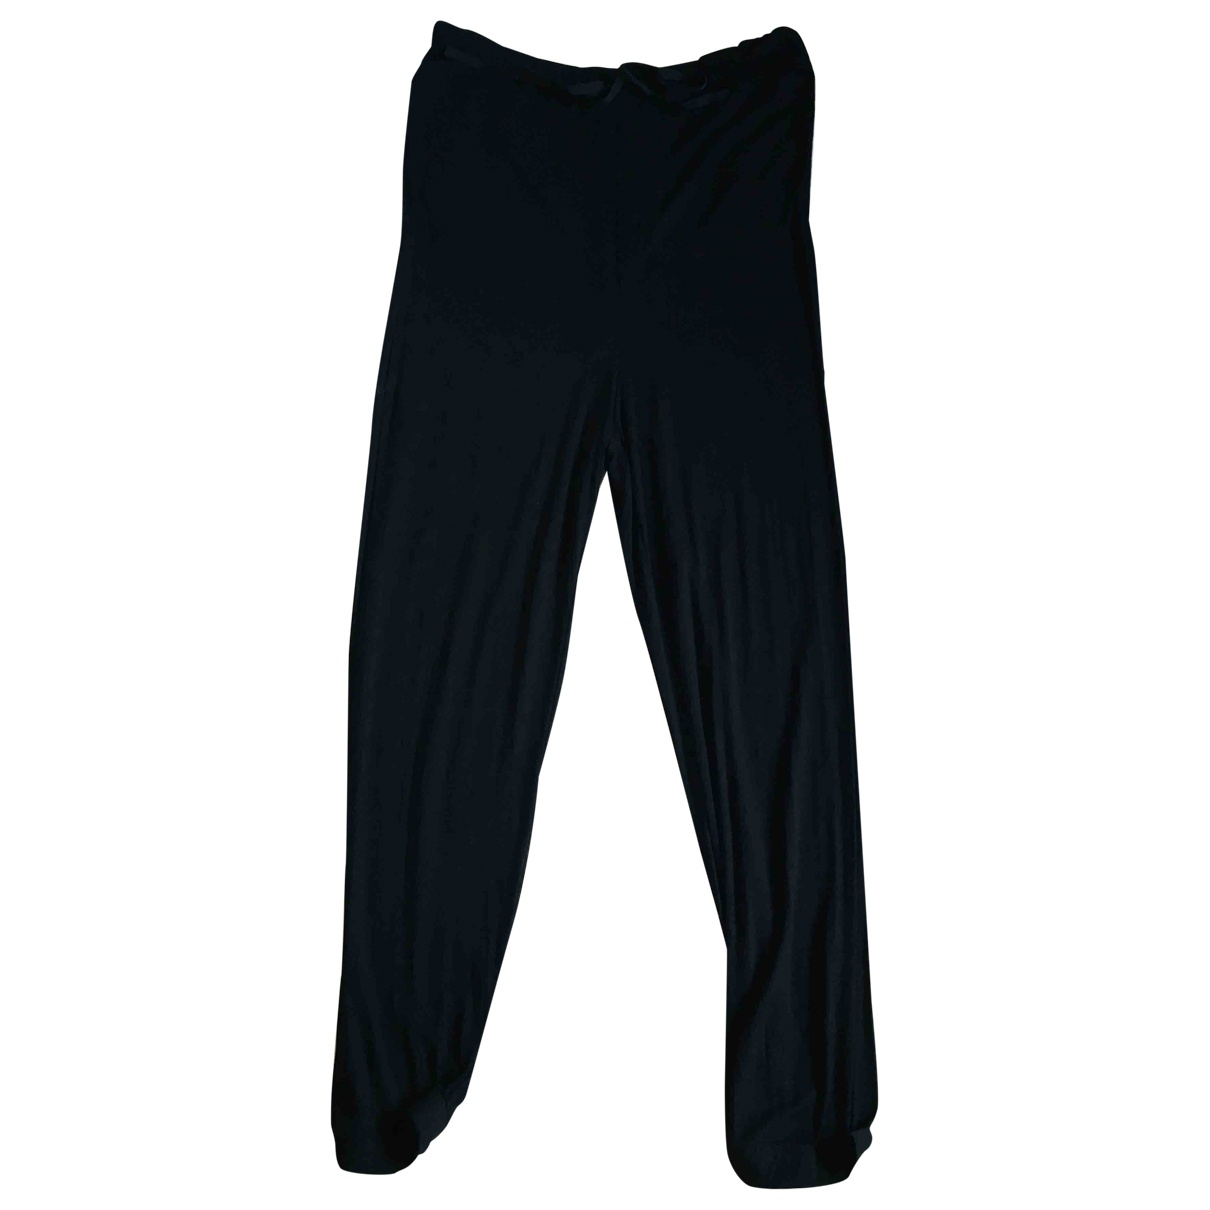 Ganni \N Black Cotton Trousers for Women S International